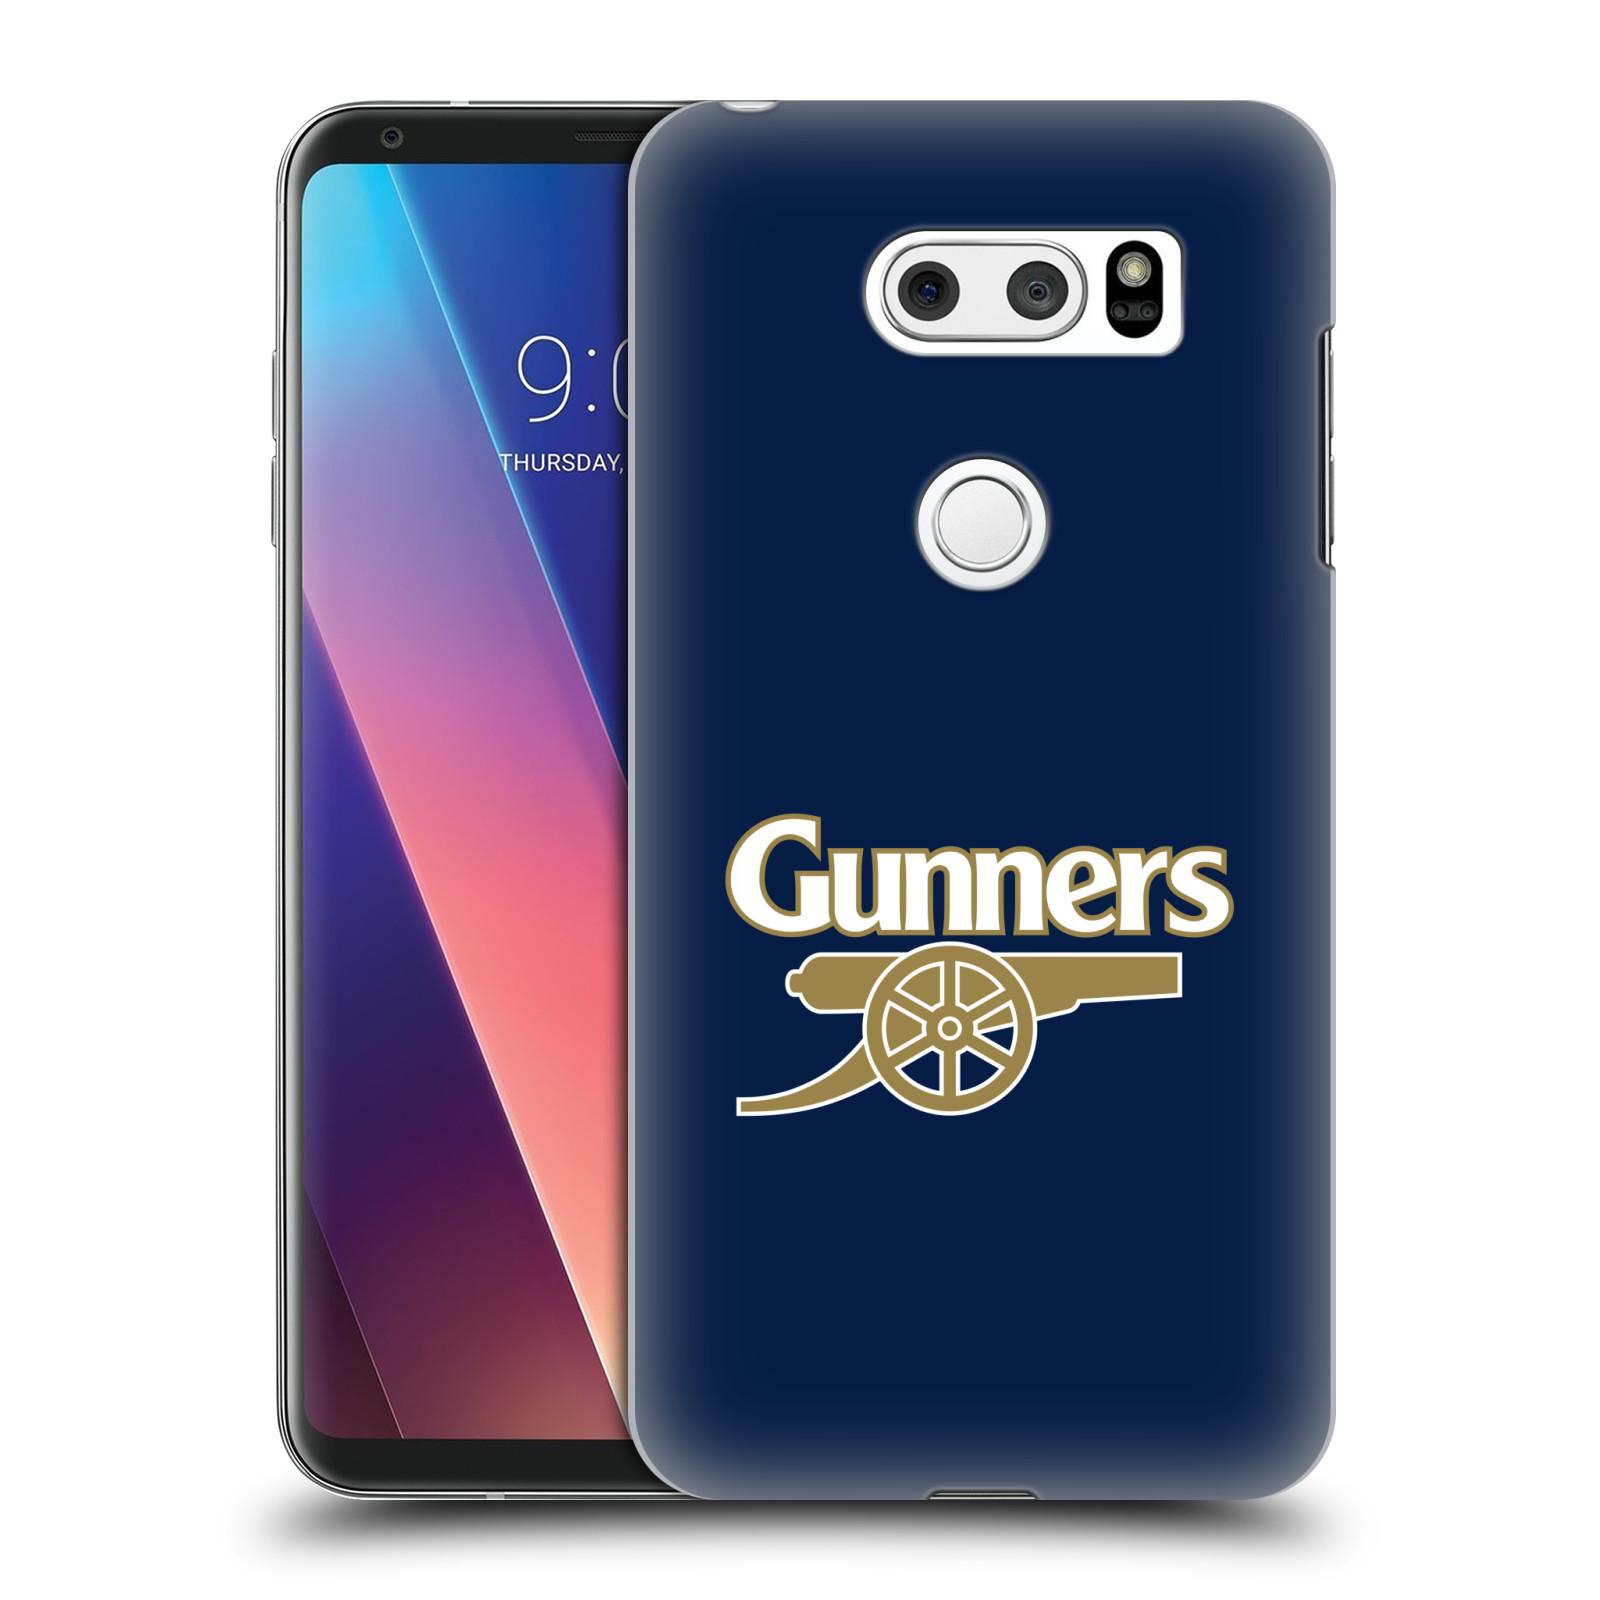 Plastové pouzdro na mobil LG V30 - Head Case - Arsenal FC - Gunners